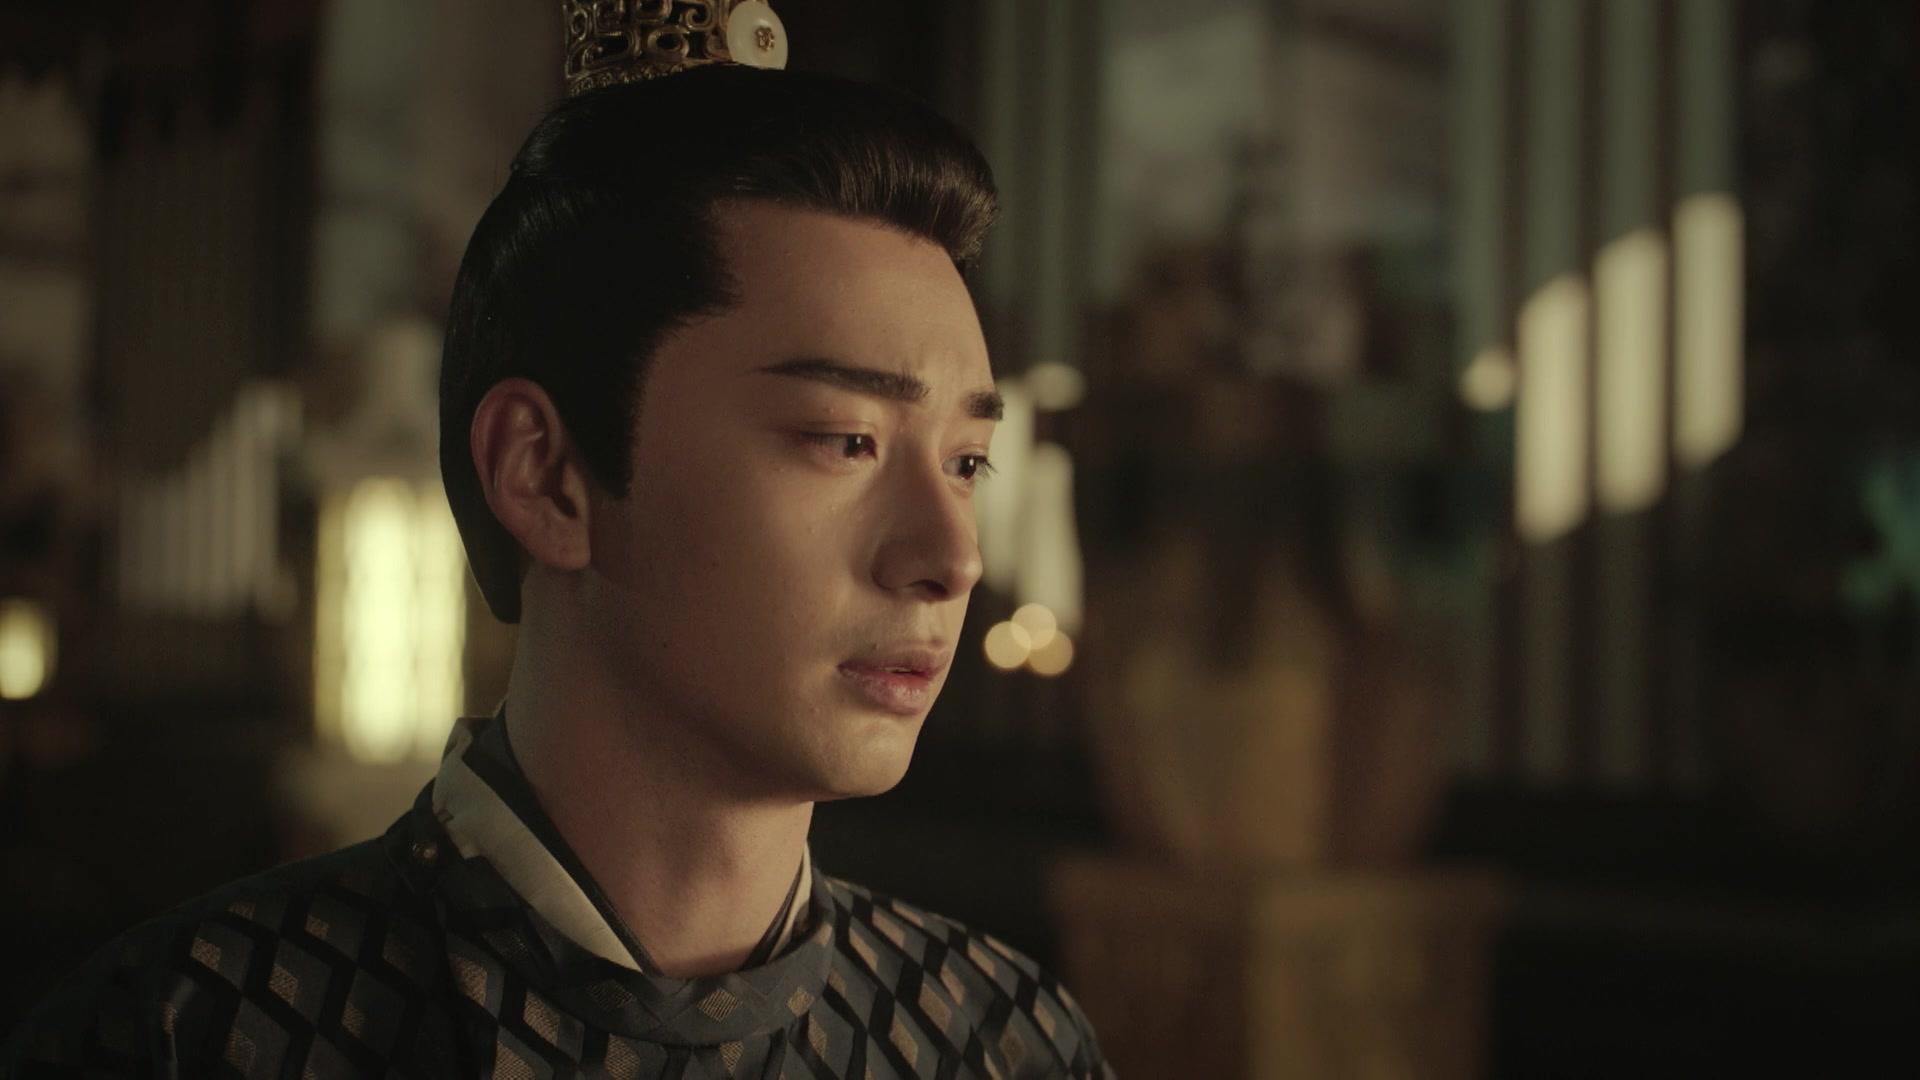 Goodbye My Princess Episode 37